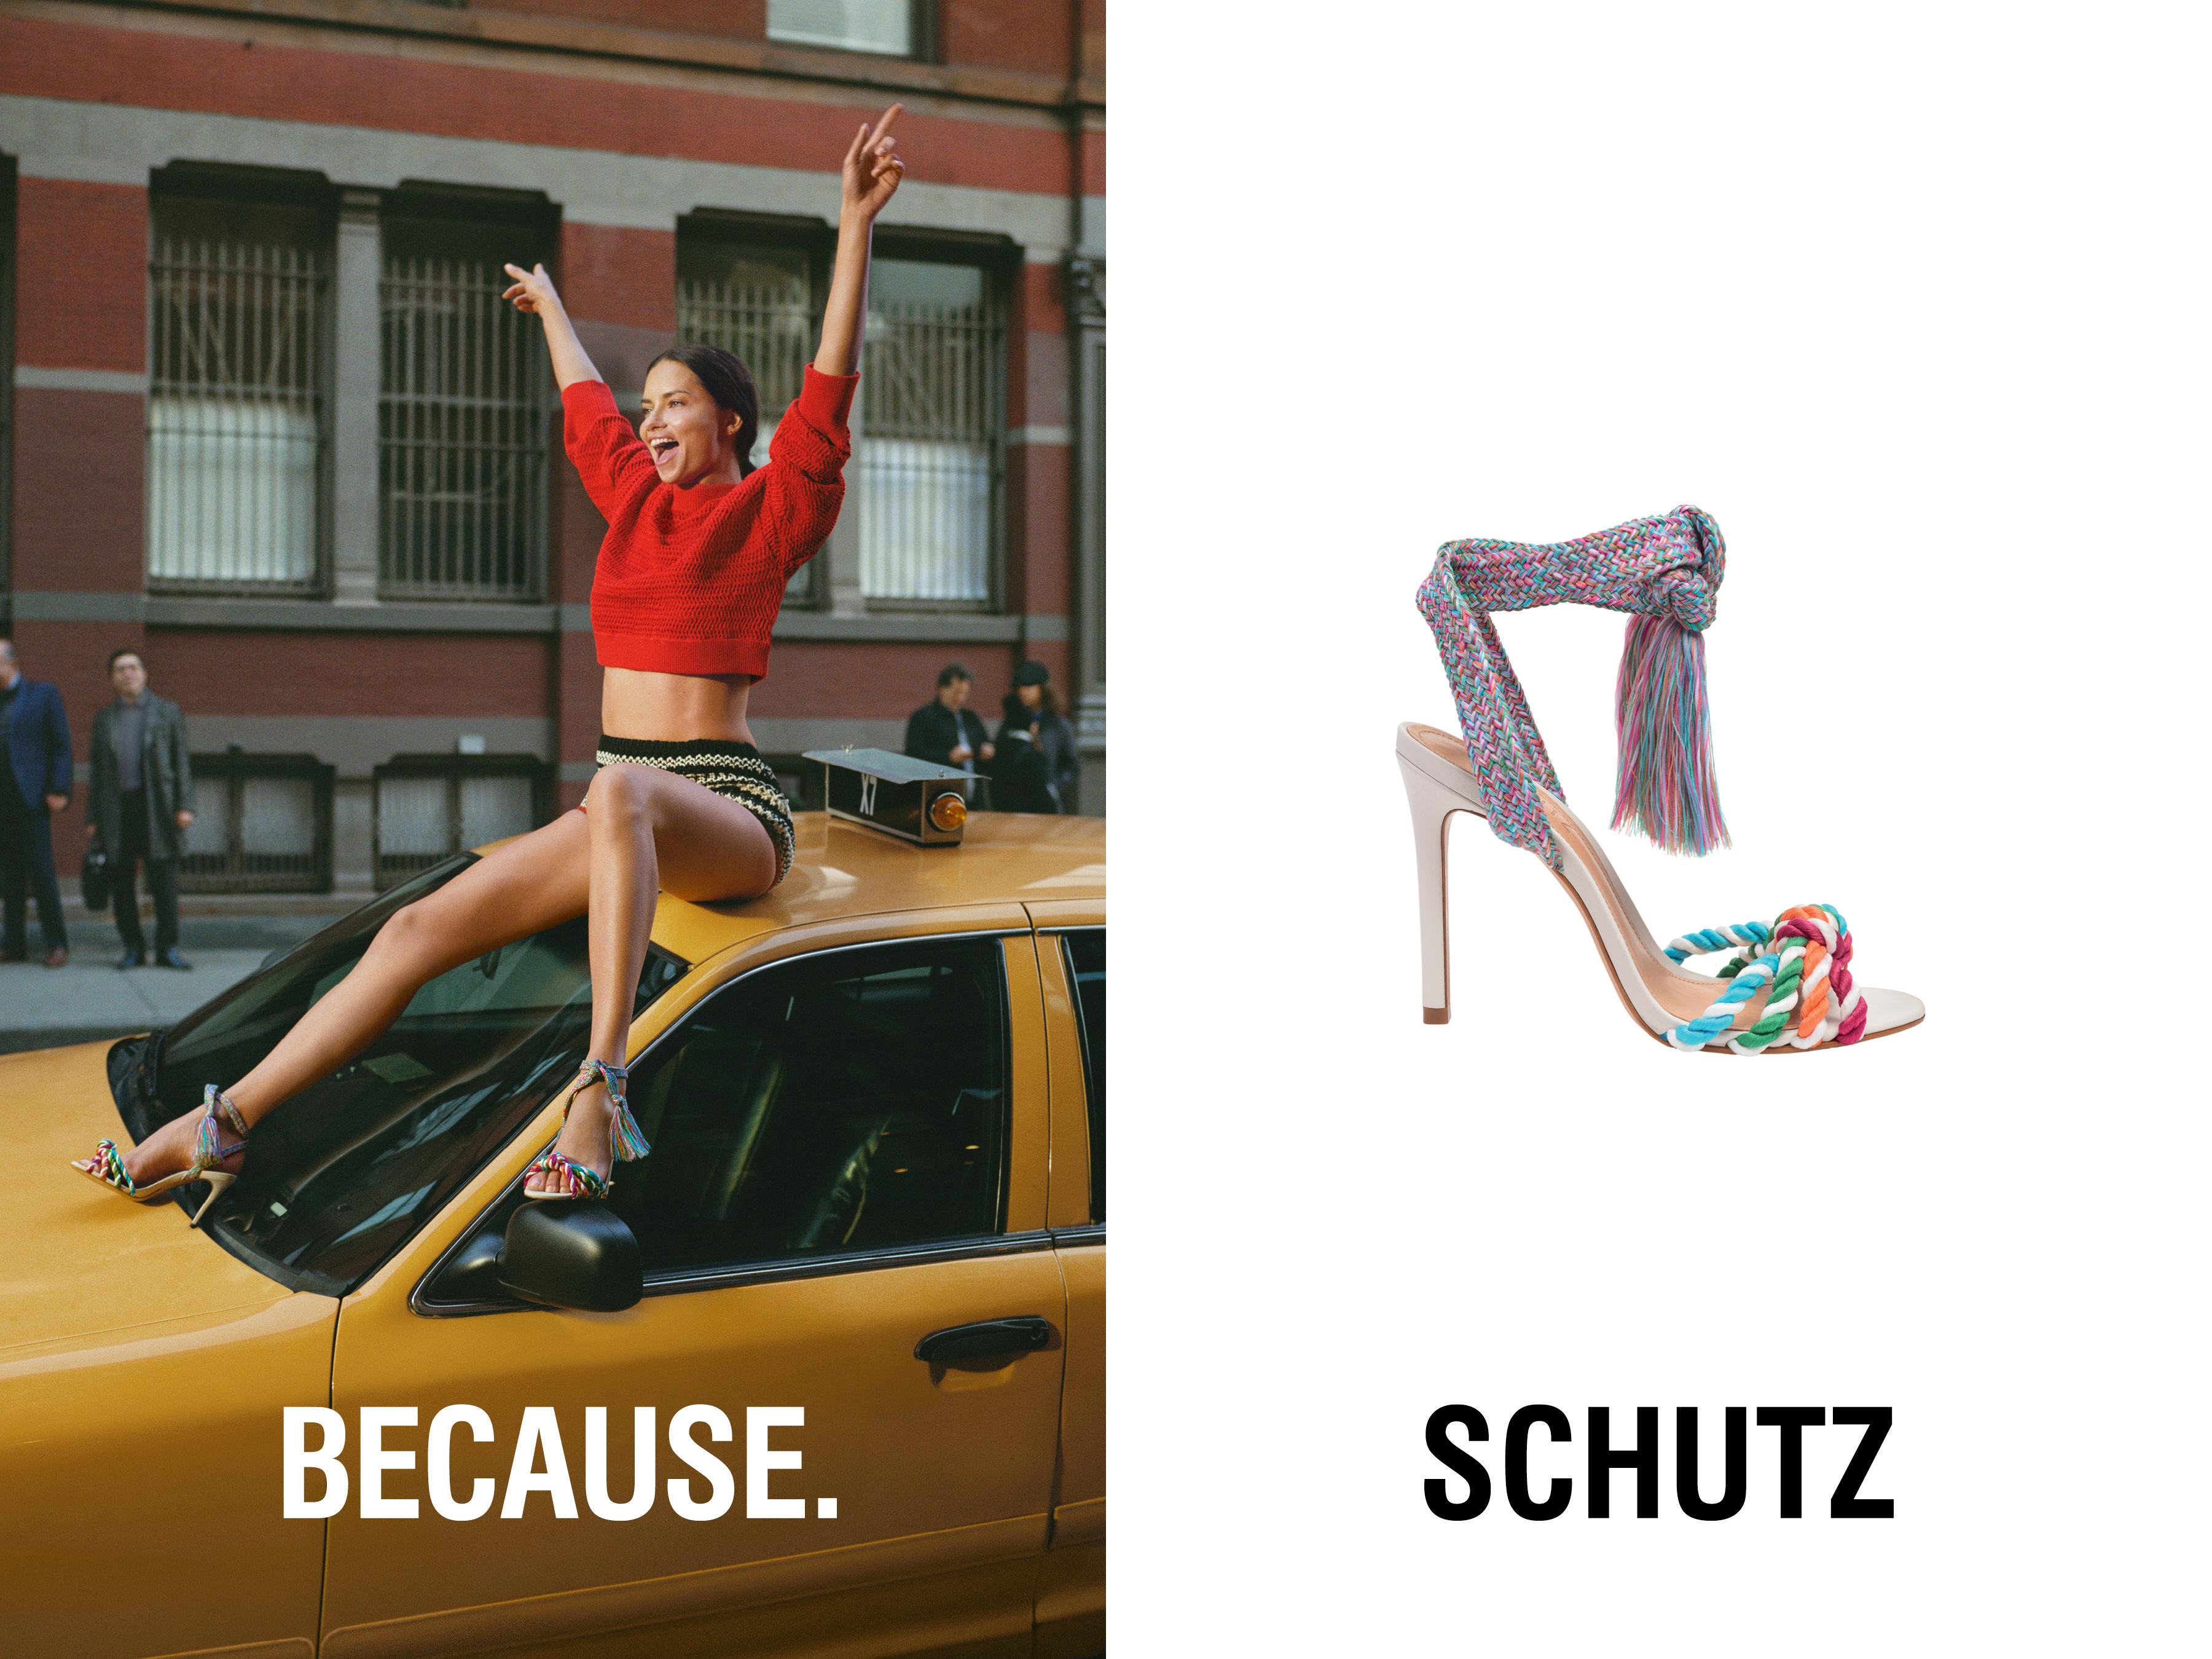 Schutz_Because_Press_RGB1